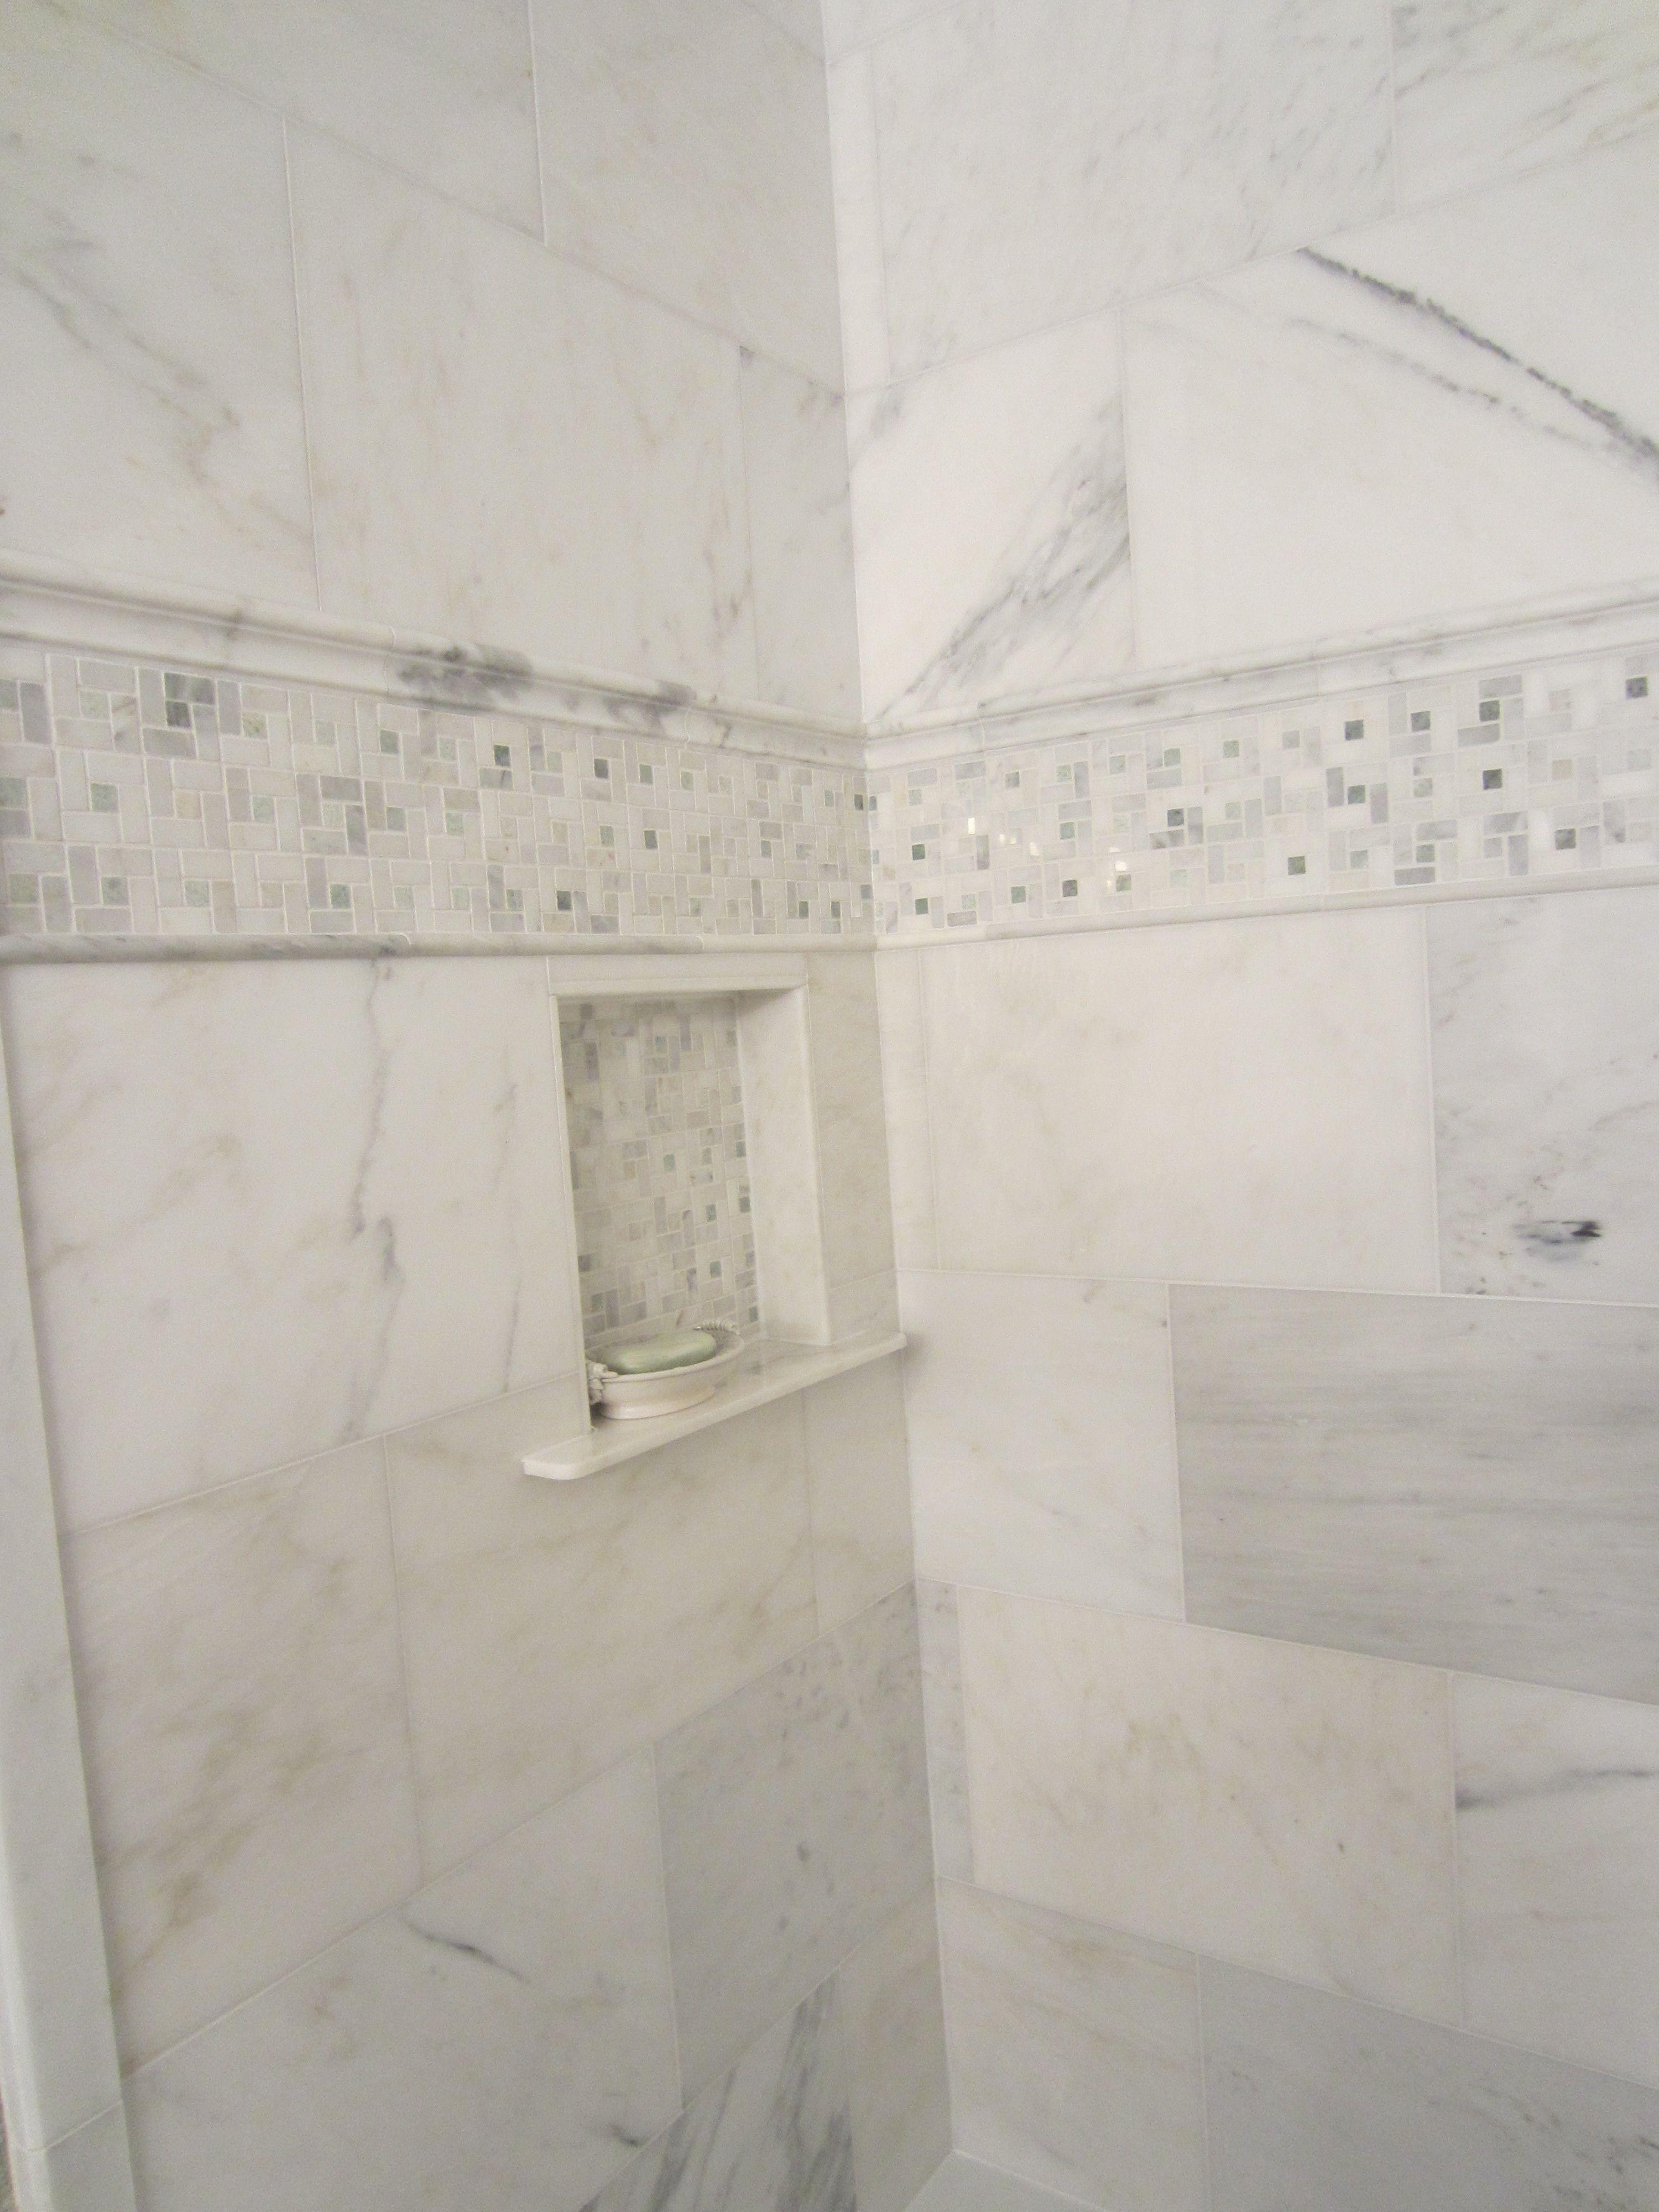 Decorative Accent Tiles For Bathroom Carrara Mable Tiles With Decorative Accent And Builtin Niche